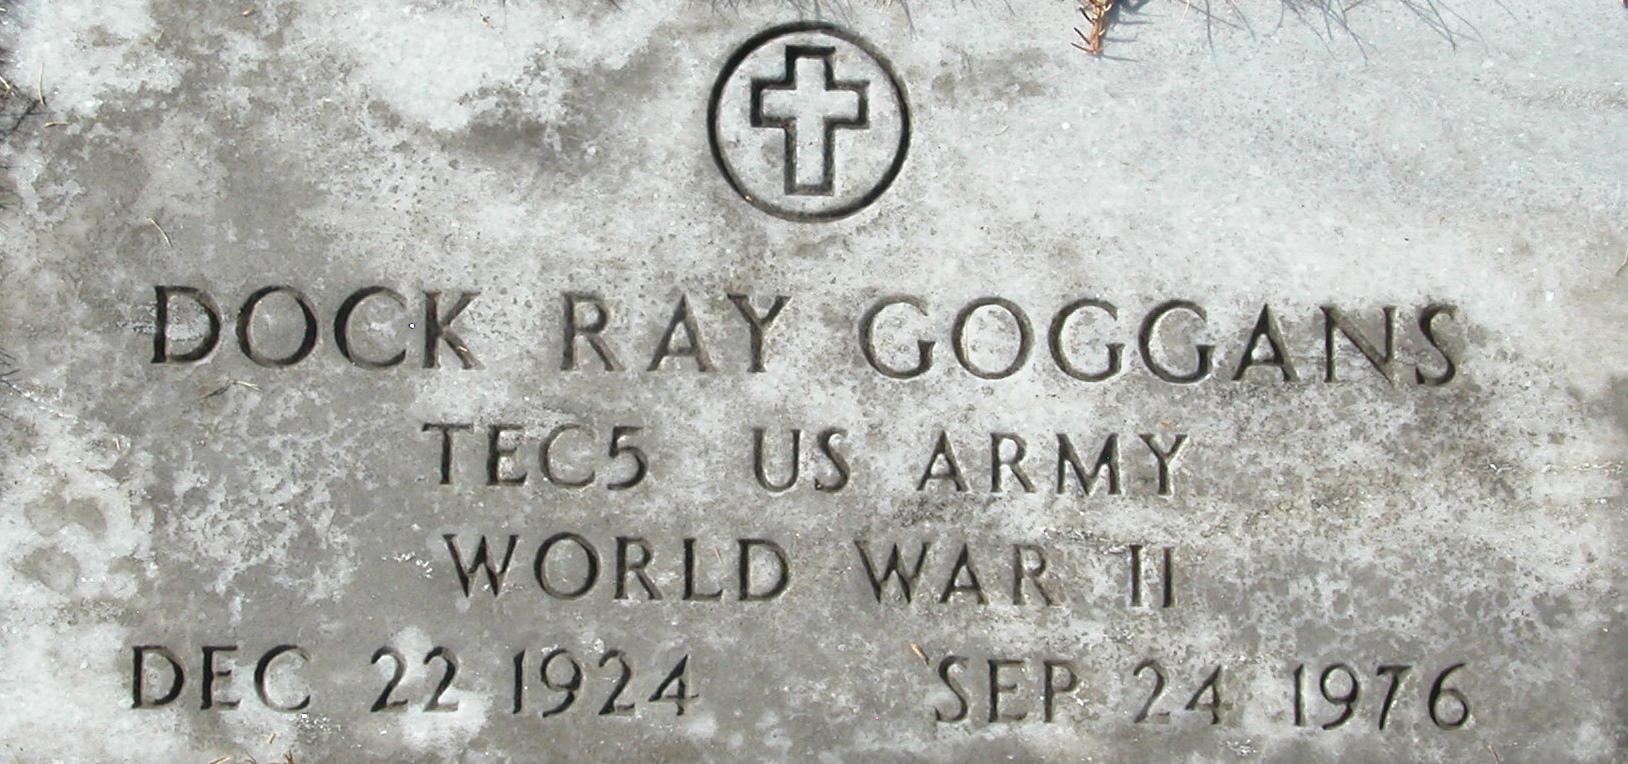 Edsel Rexford Goggans